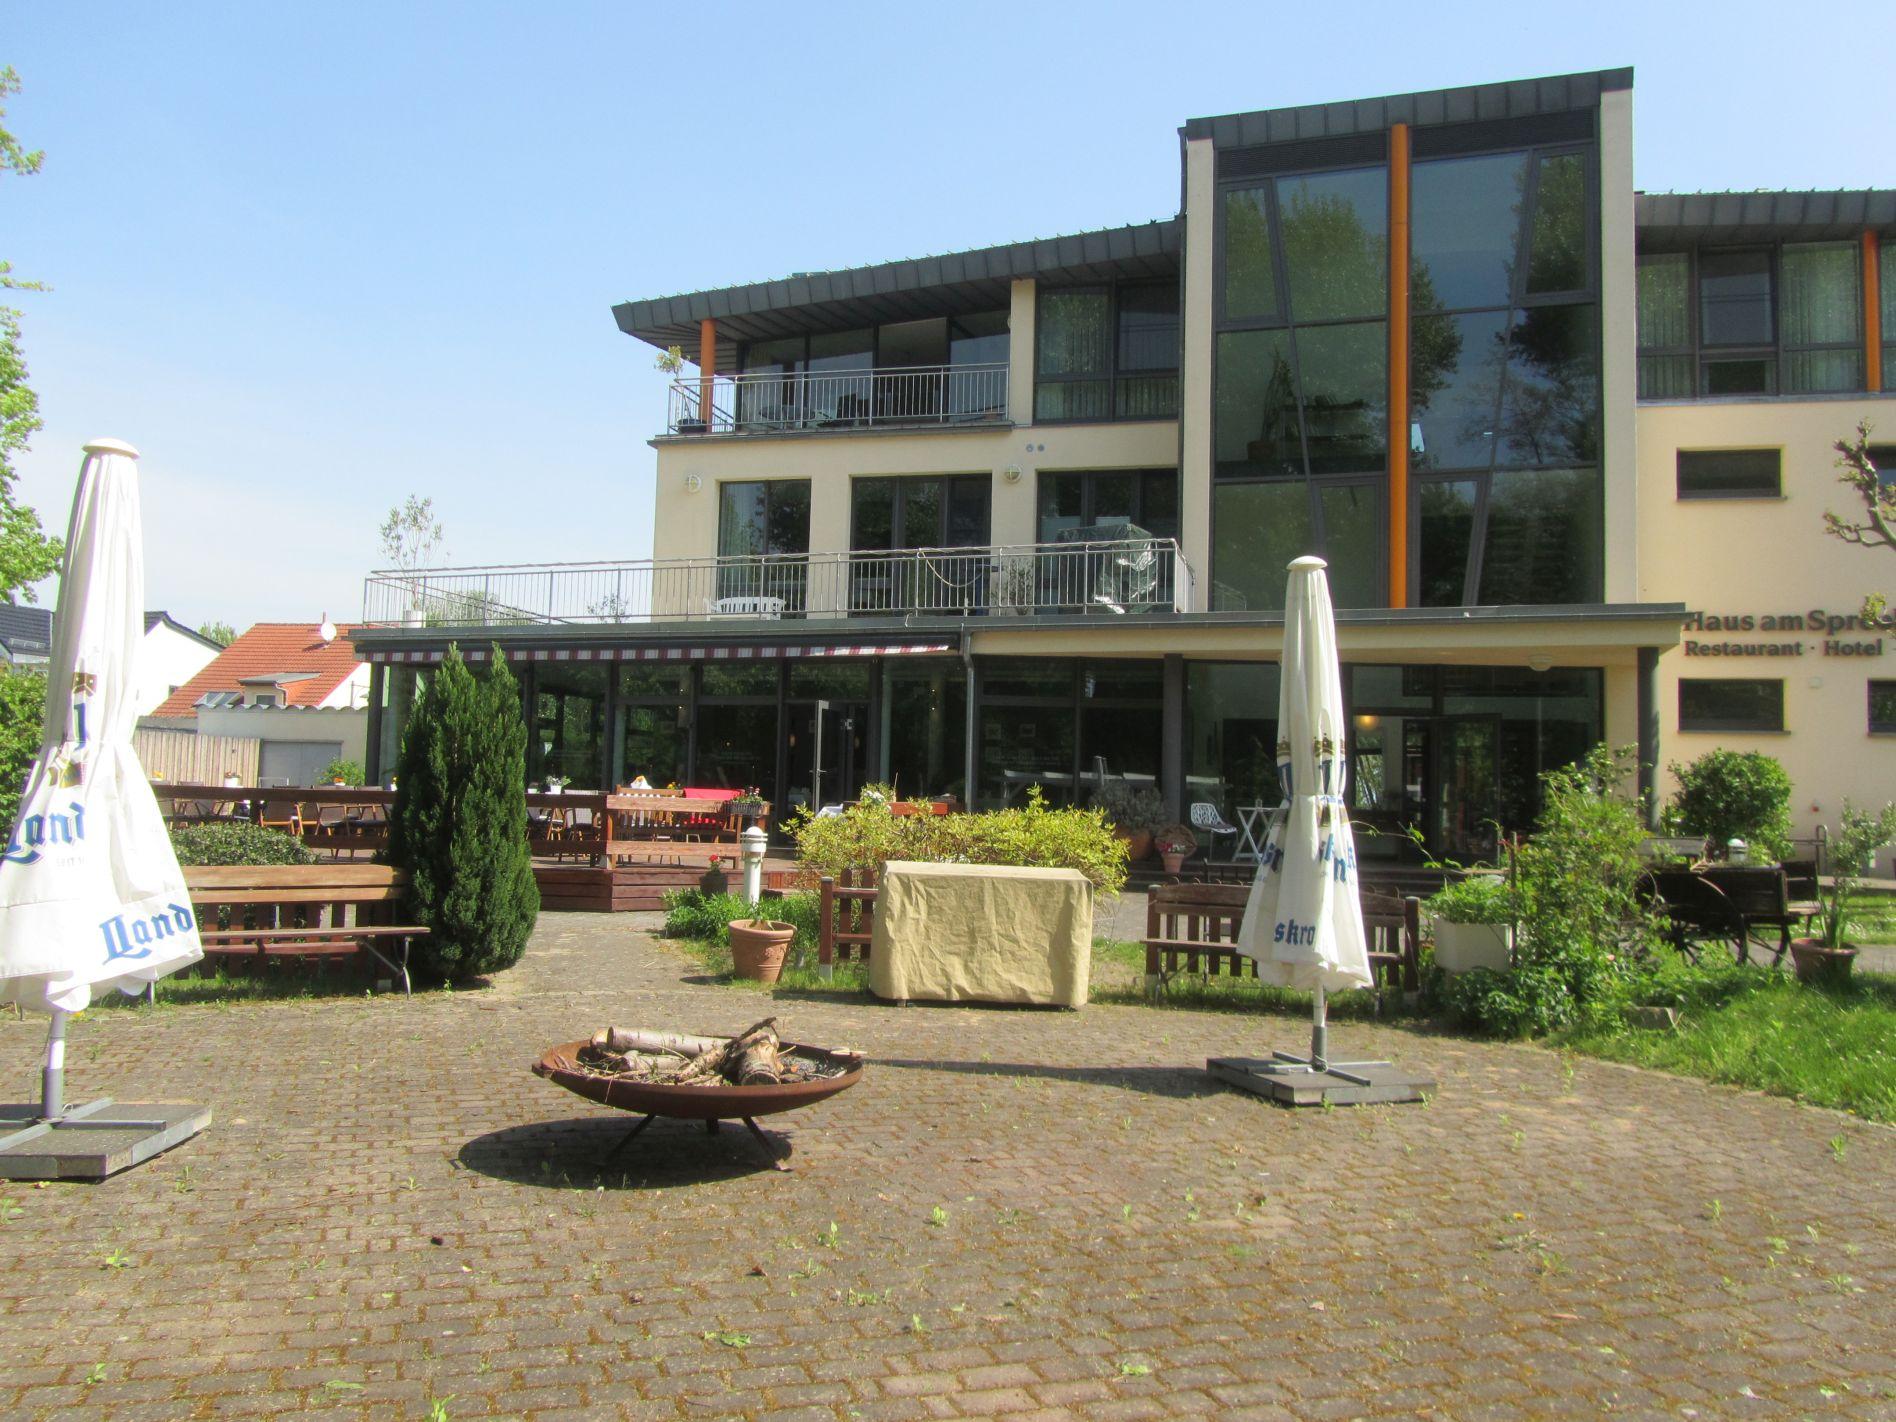 Haus am Spreebogen   Anleger am Spree-Oder-Kanal